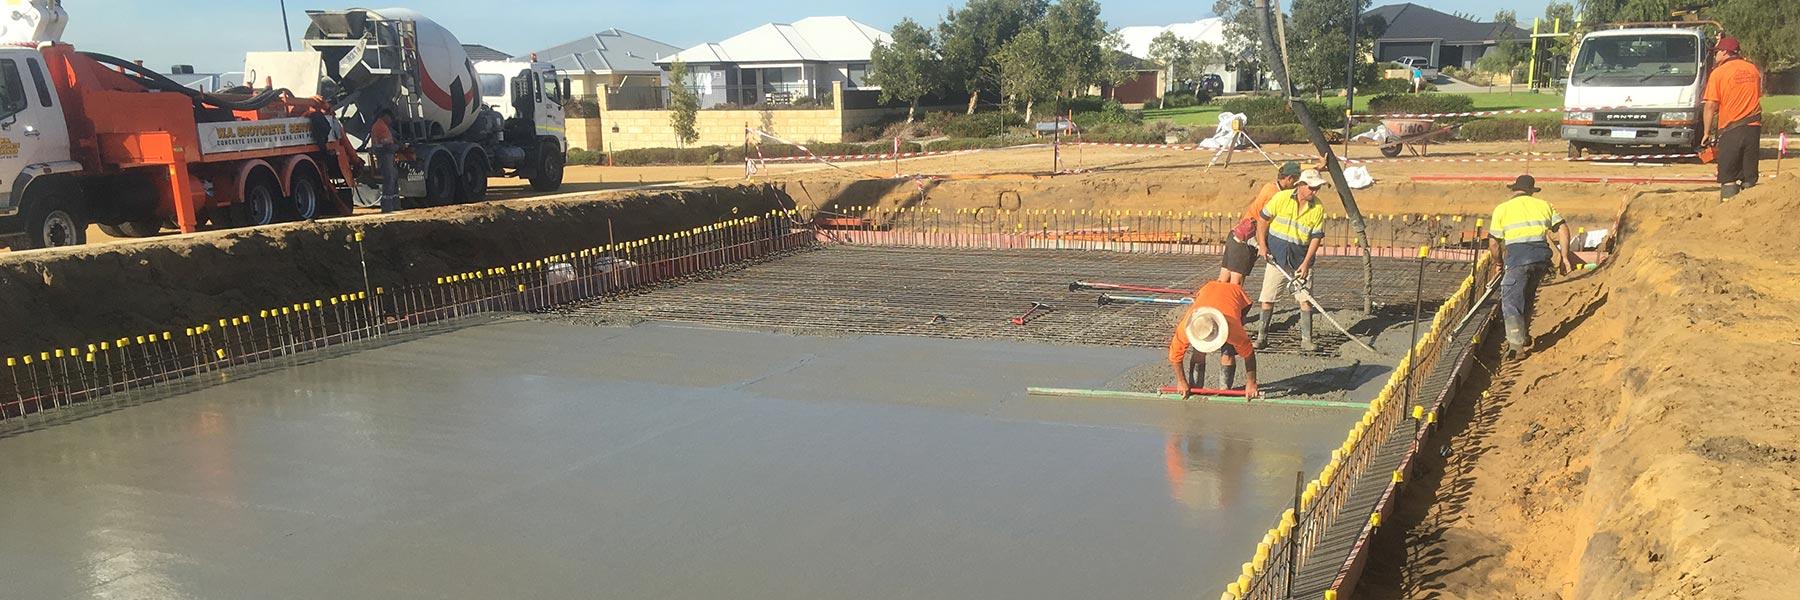 Stateswim Pool Construction